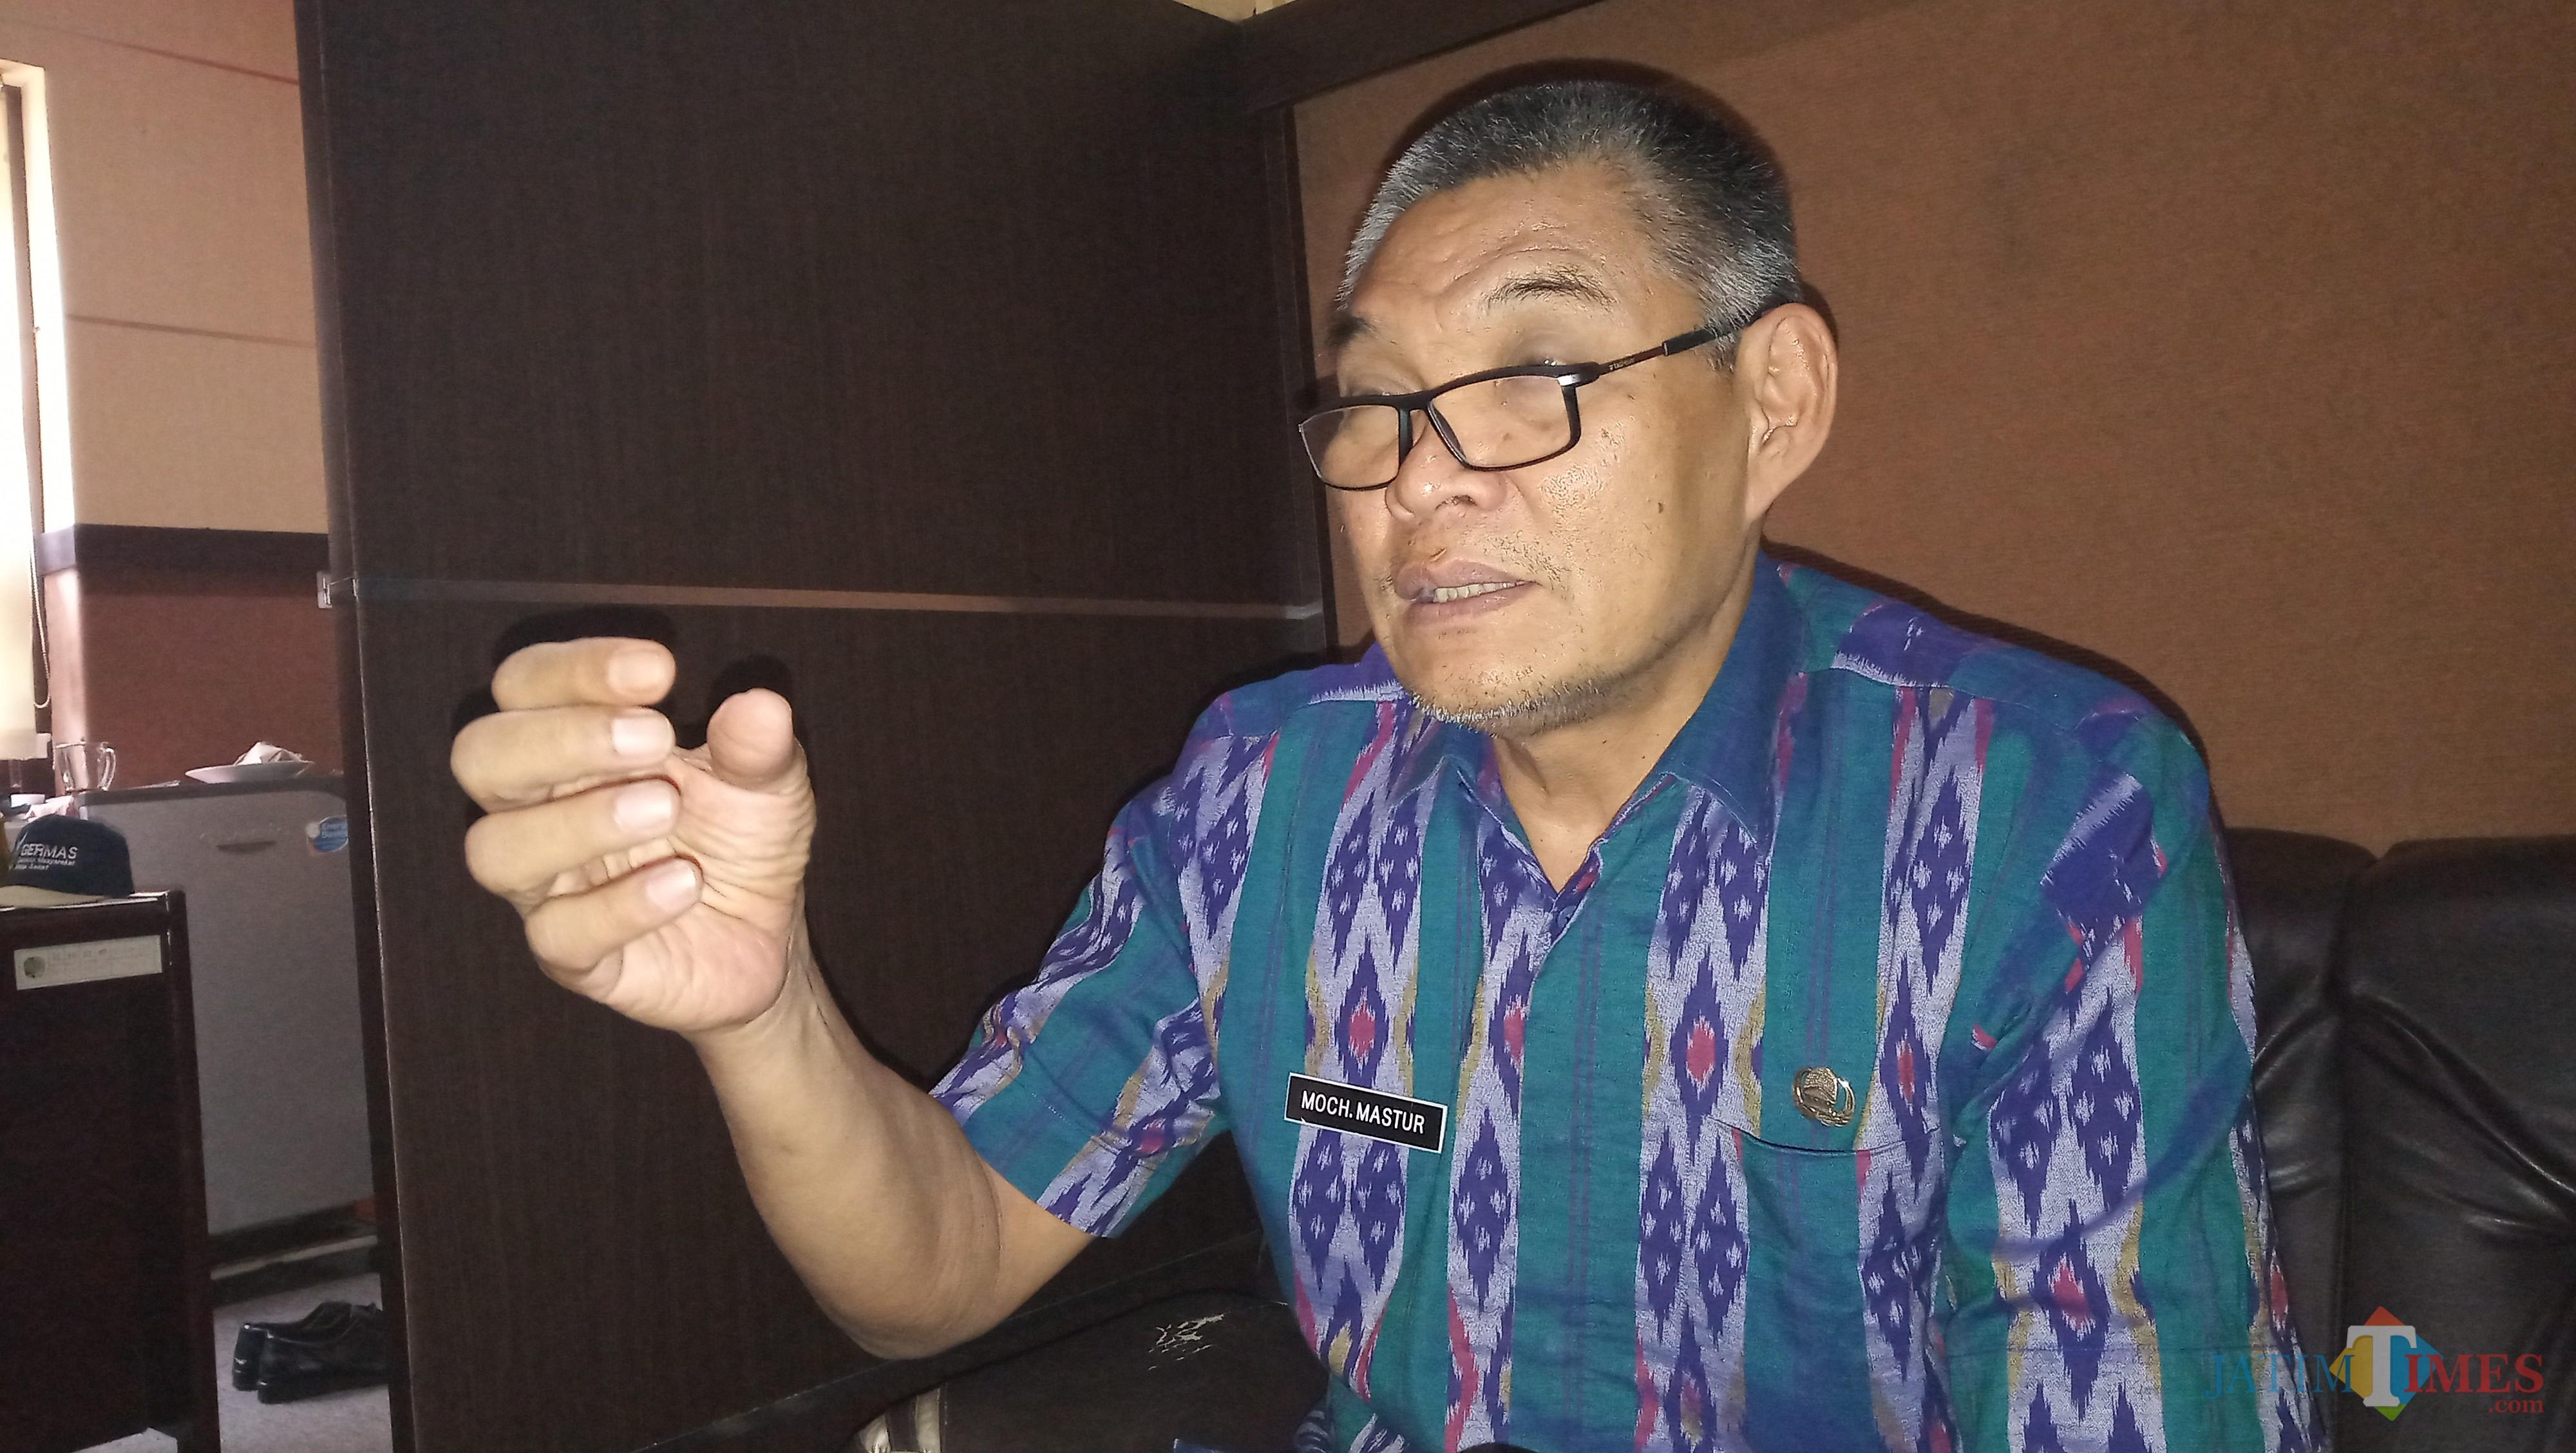 Kadinkes Tulungagung  Mochammad Mastur (foto : Joko Pramono/Jatim Times)